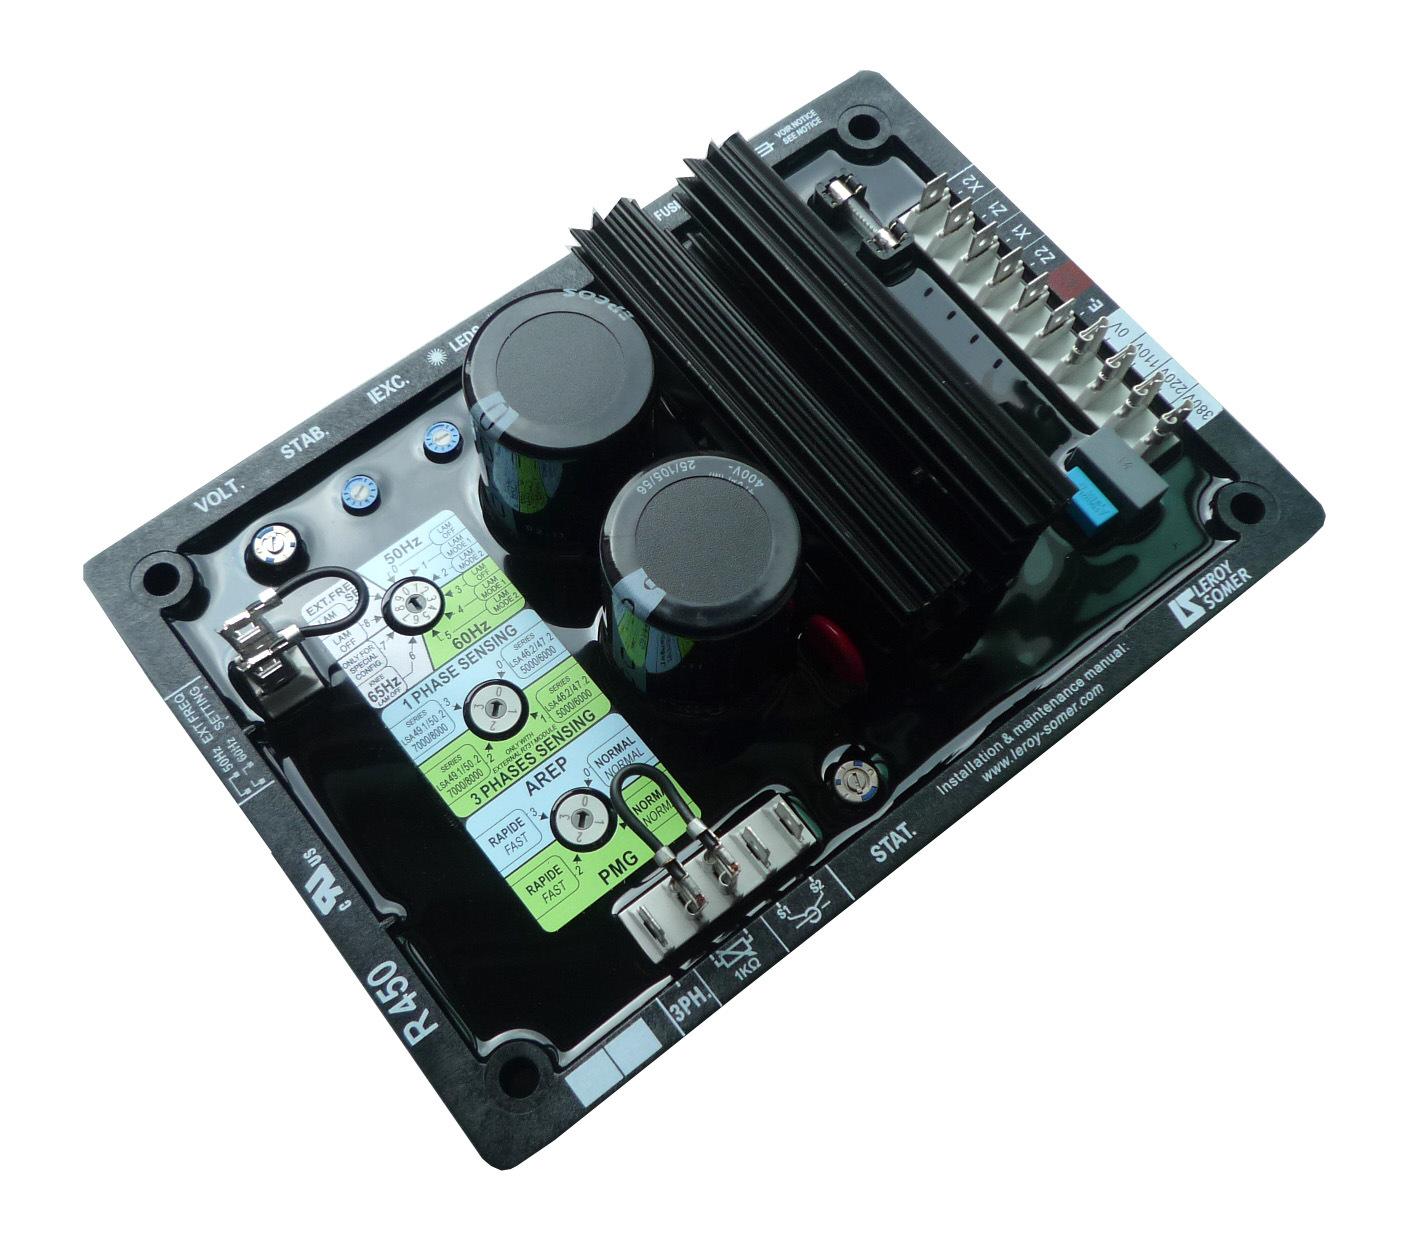 Basler Transformer Wiring Diagram : China leroy somer avr r m t photos pictures